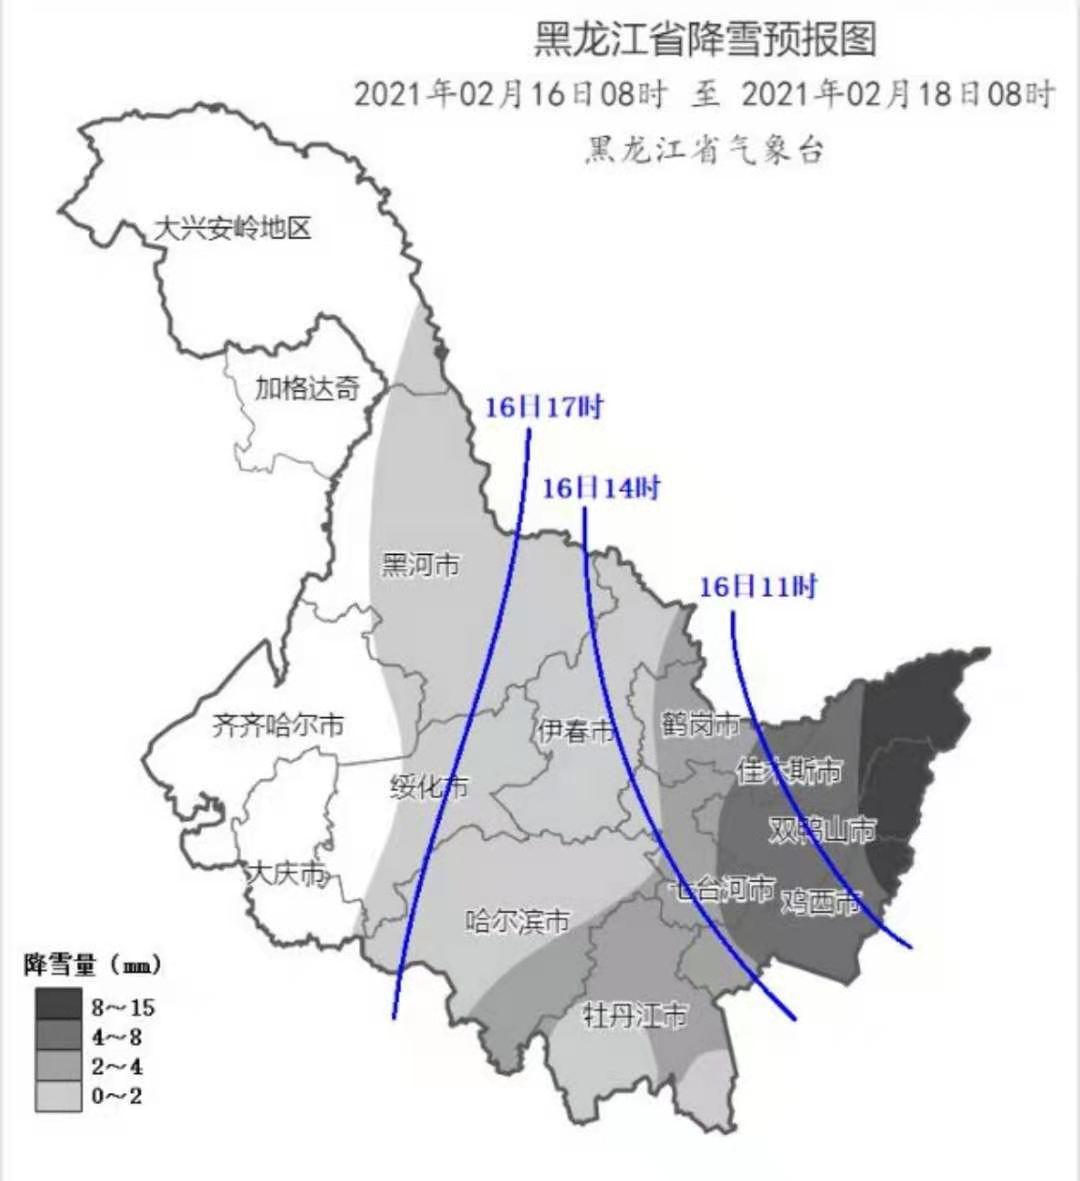 http://i.weather.com.cn/images/heilongjiang/tqyw/2021/02/15/1613347662704027199.jpg